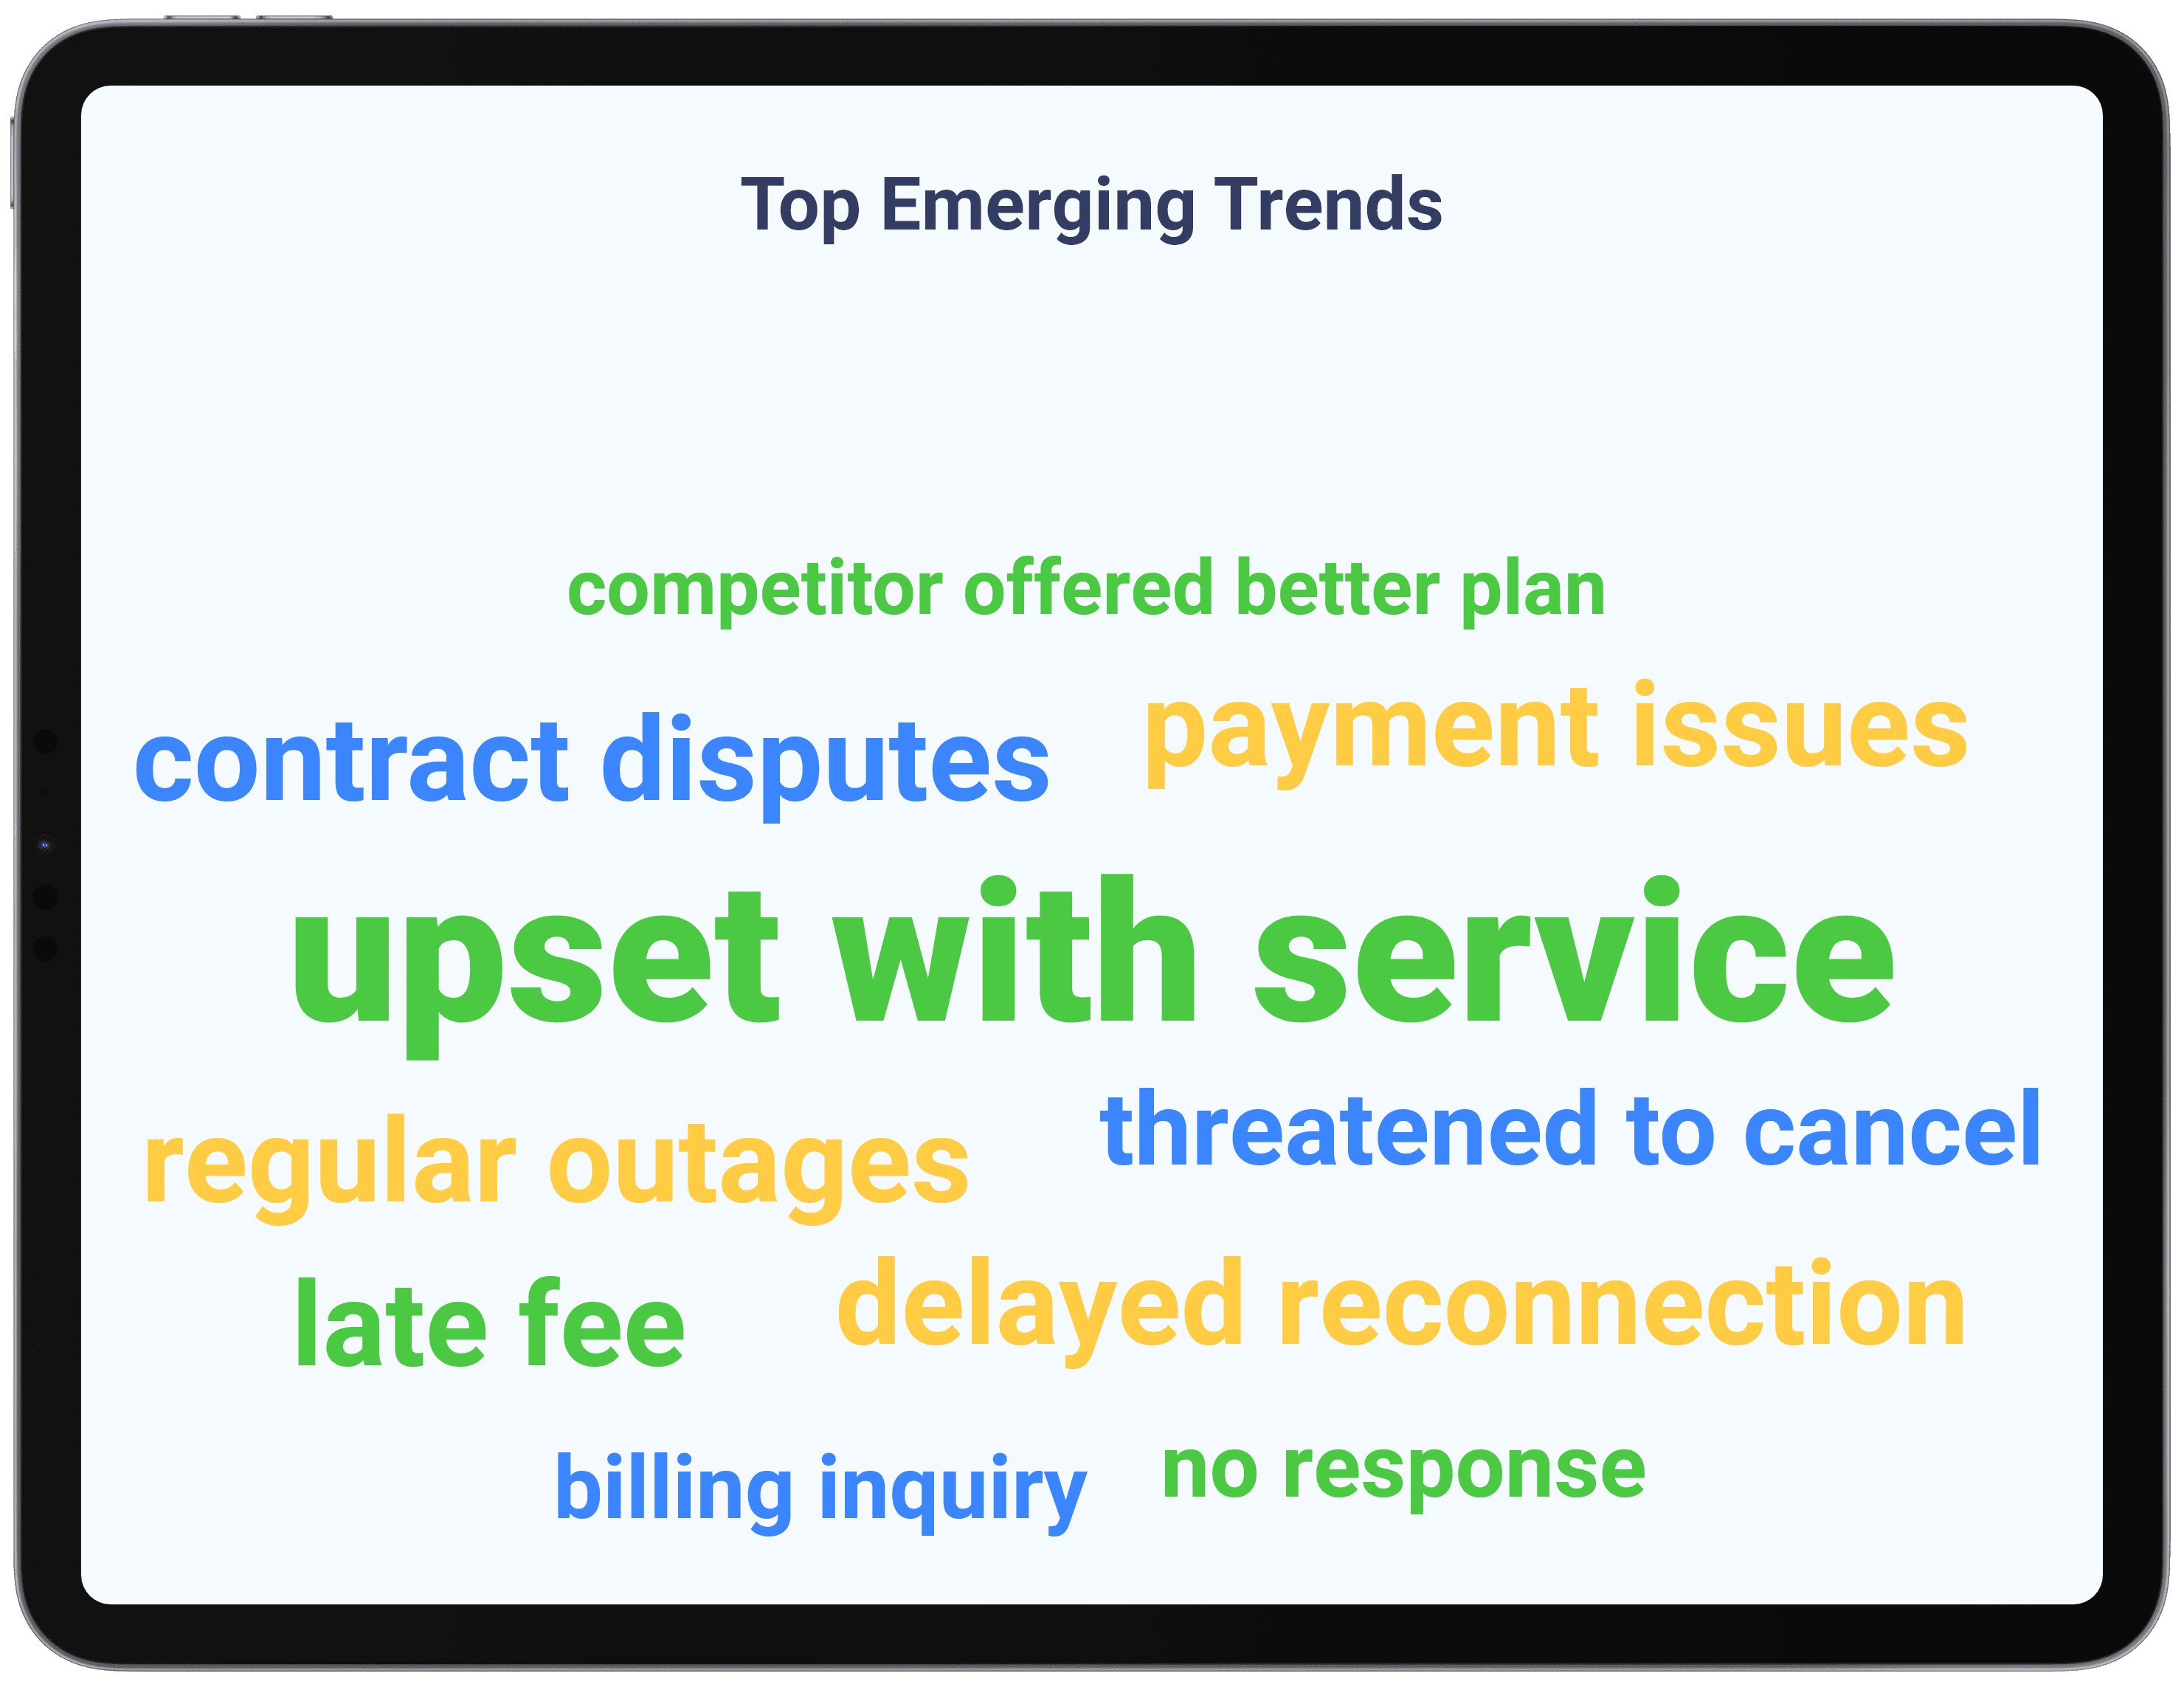 Utilities - Identify Trending Topics